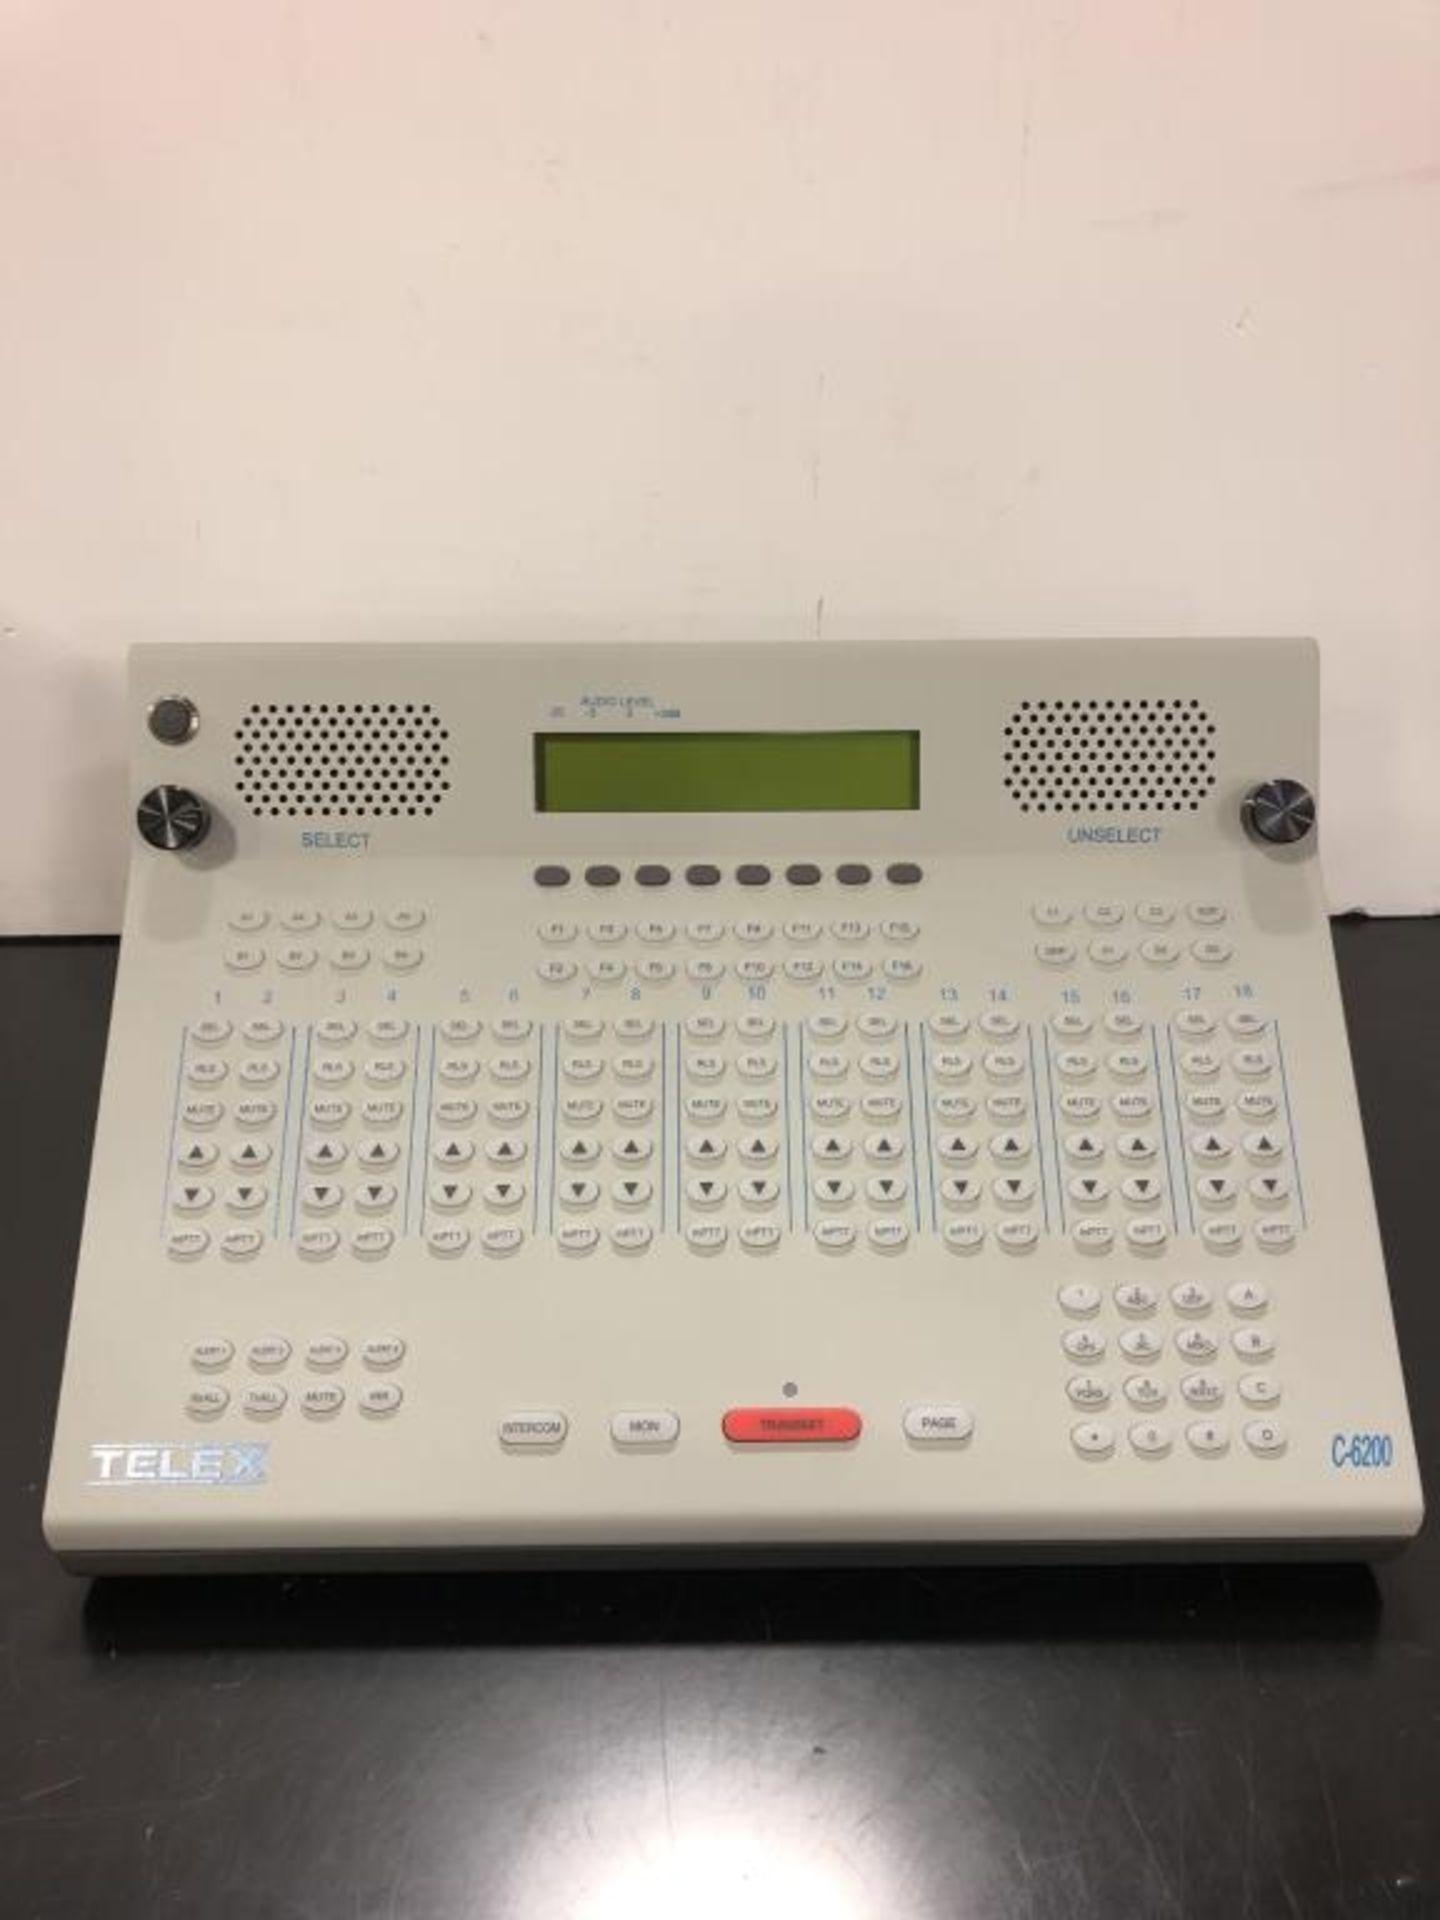 Lot 265 - VOIP Radio Dispatch Control